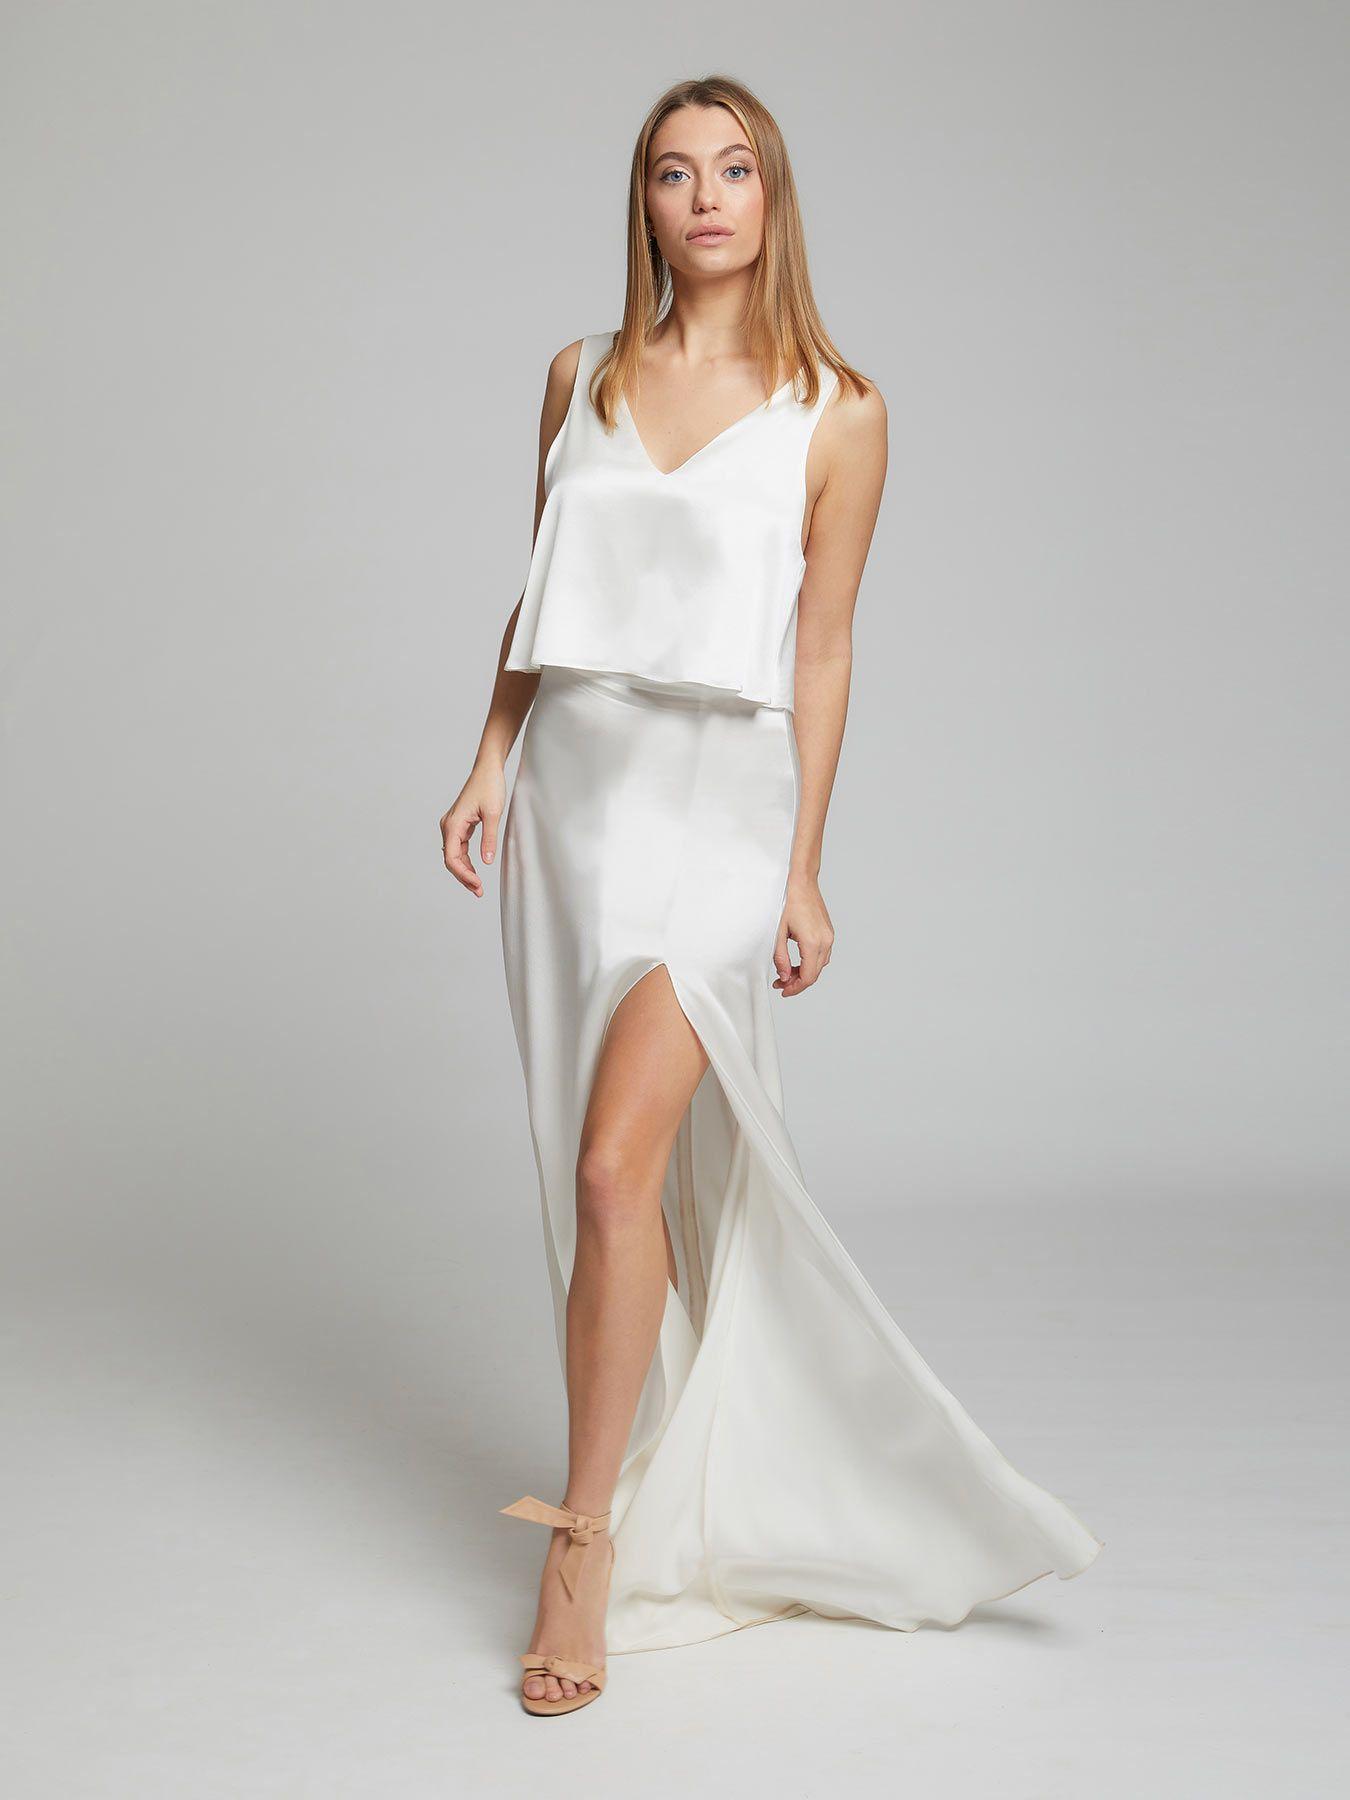 Pin On The White Dress [ 1800 x 1350 Pixel ]